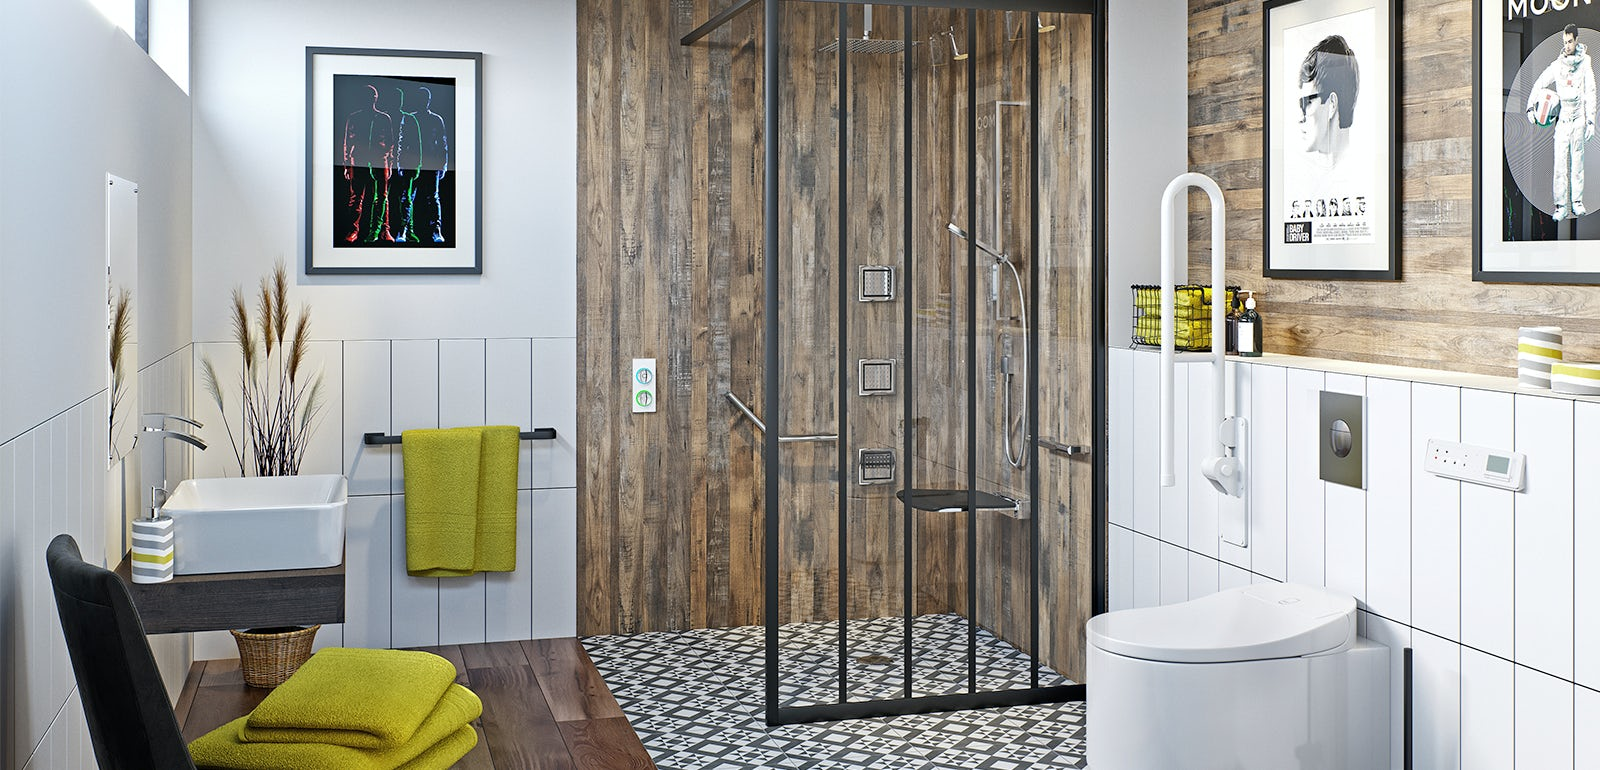 How To Create A Stylish Bathroom For A Wheelchair User - Bathroom for wheelchair user